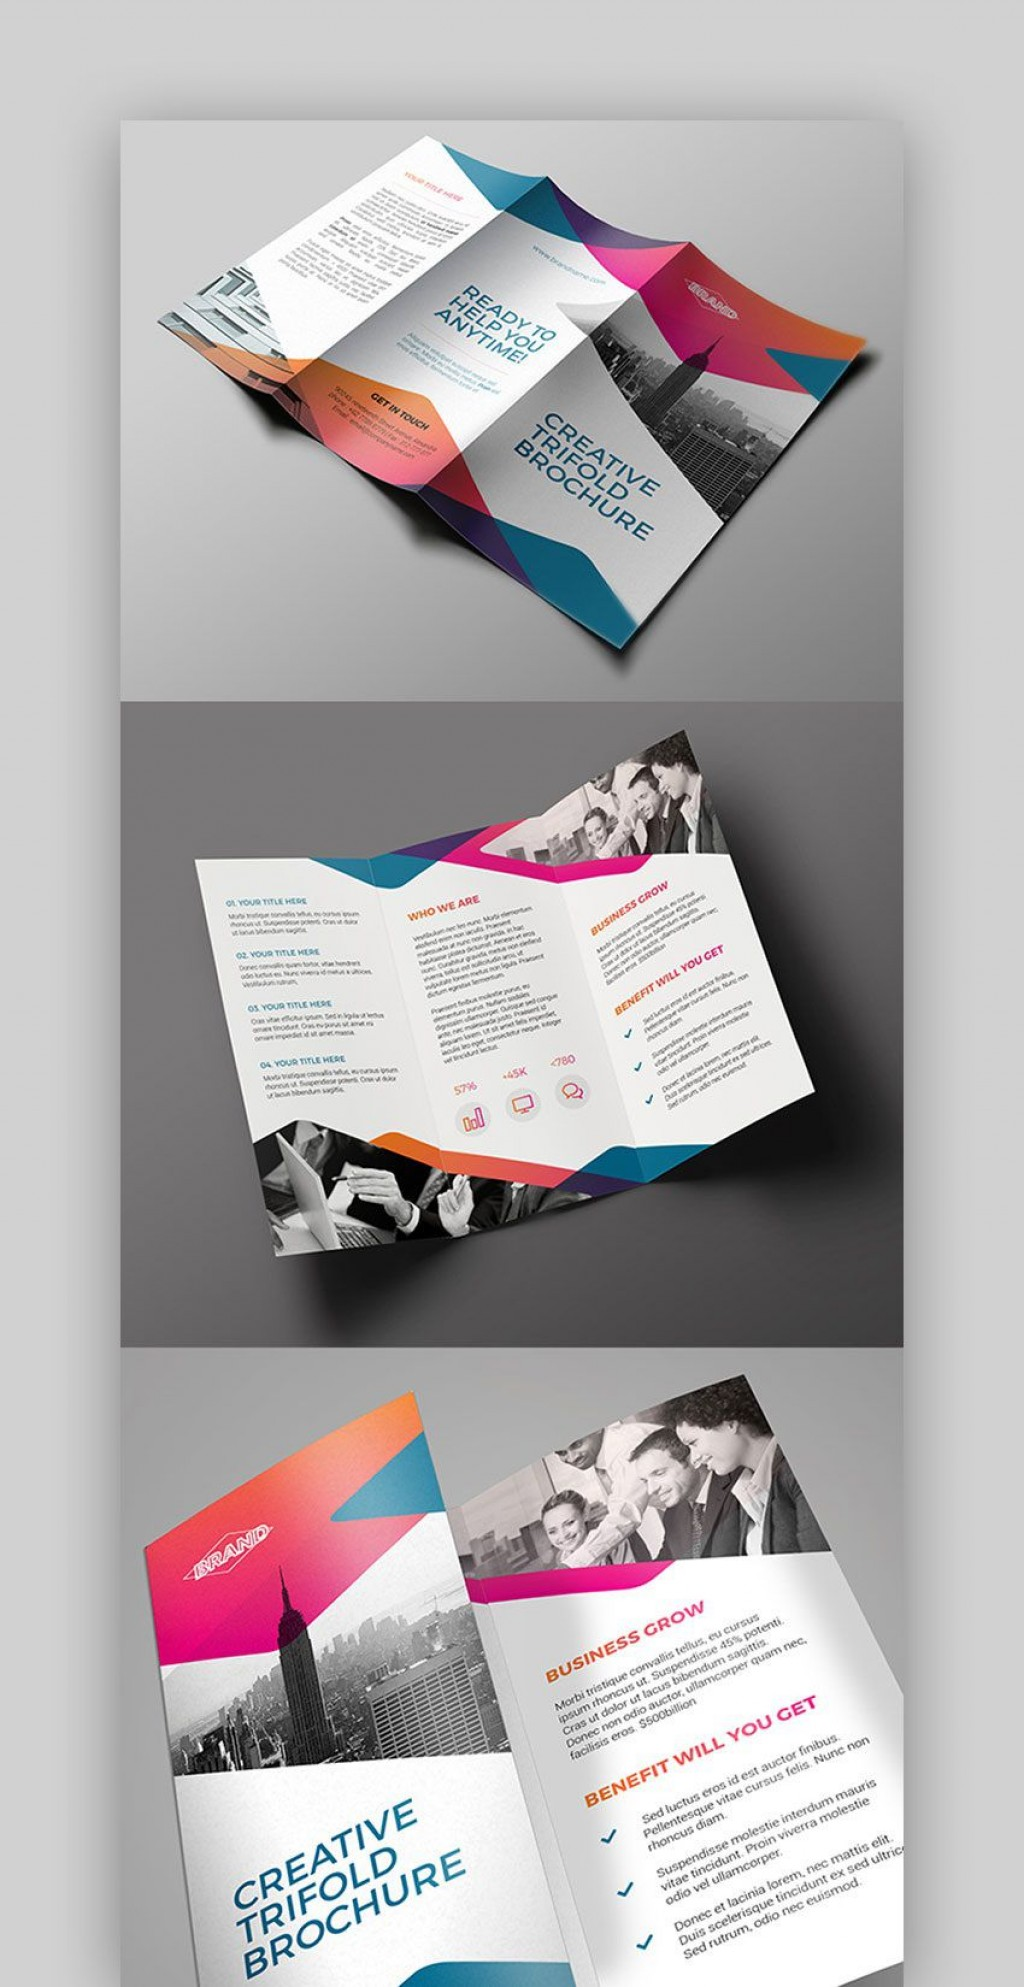 008 Amazing Indesign Trifold Brochure Template Picture  Templates Adobe Tri Fold Bi Free DownloadLarge